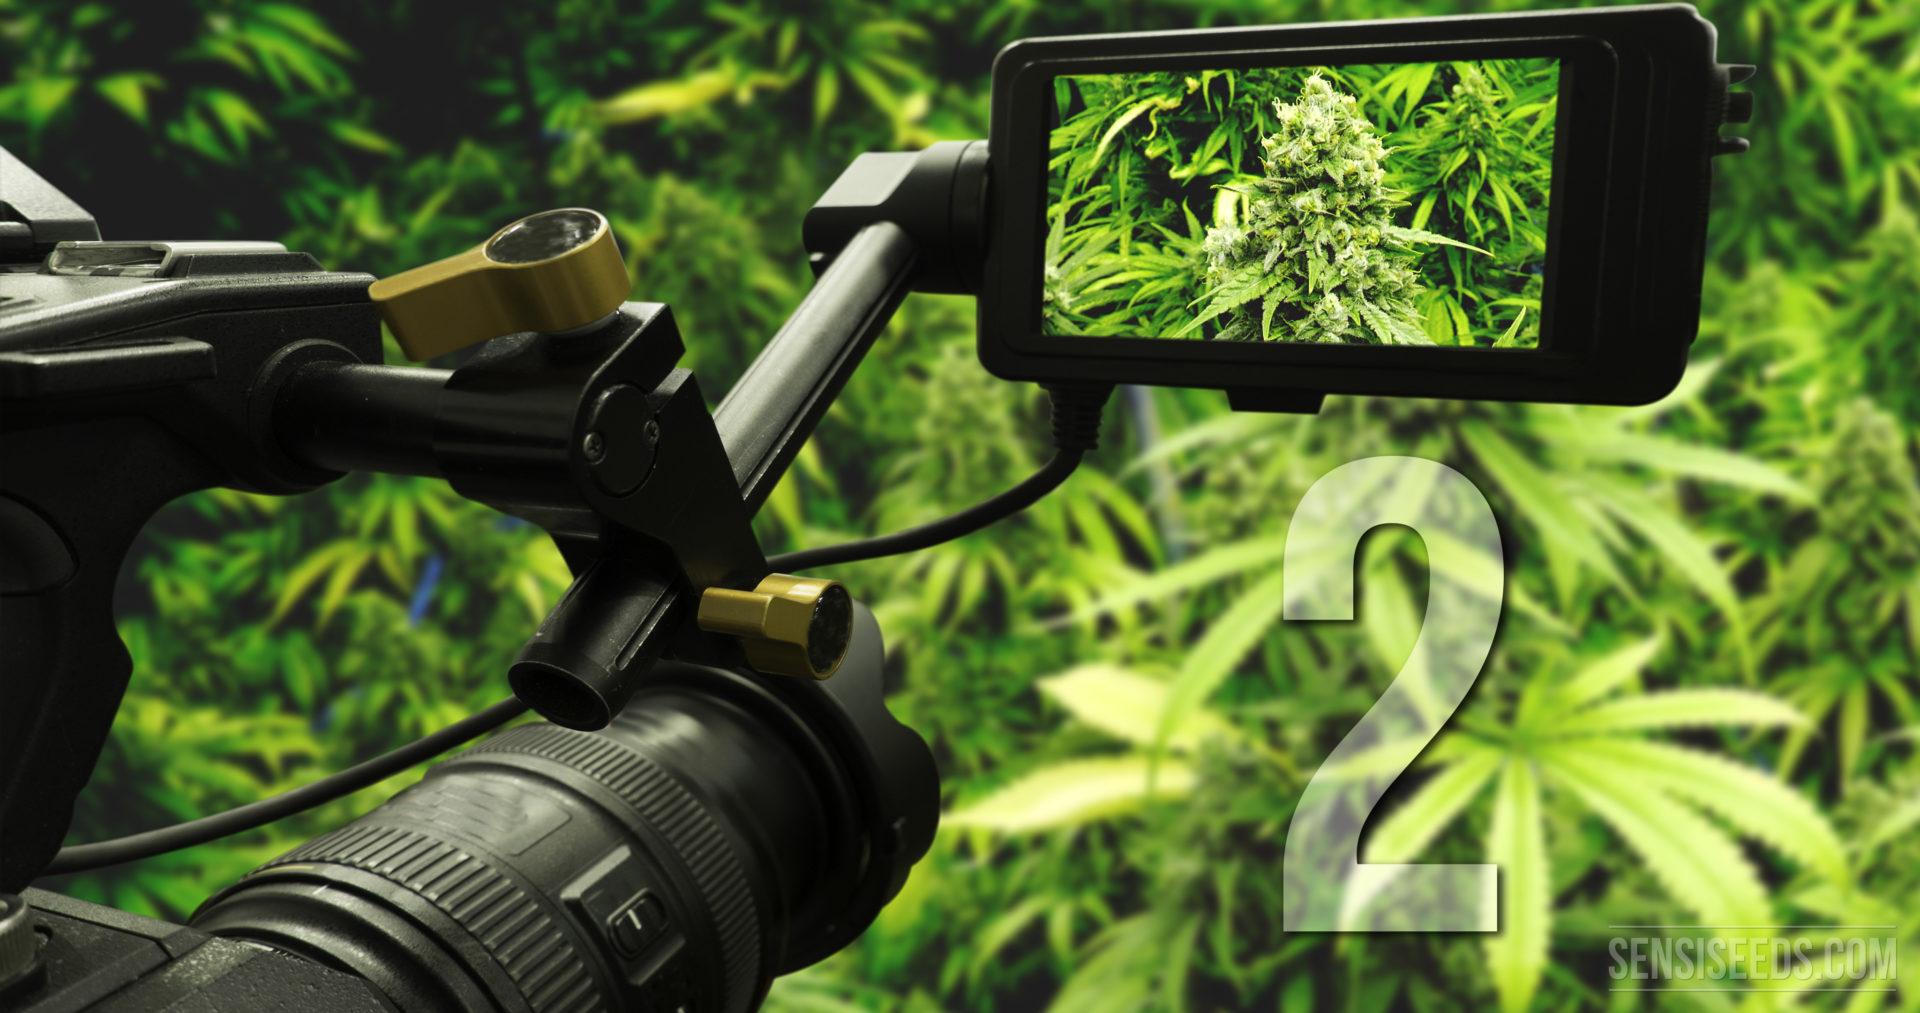 Newest 2015 cannabis documentaries